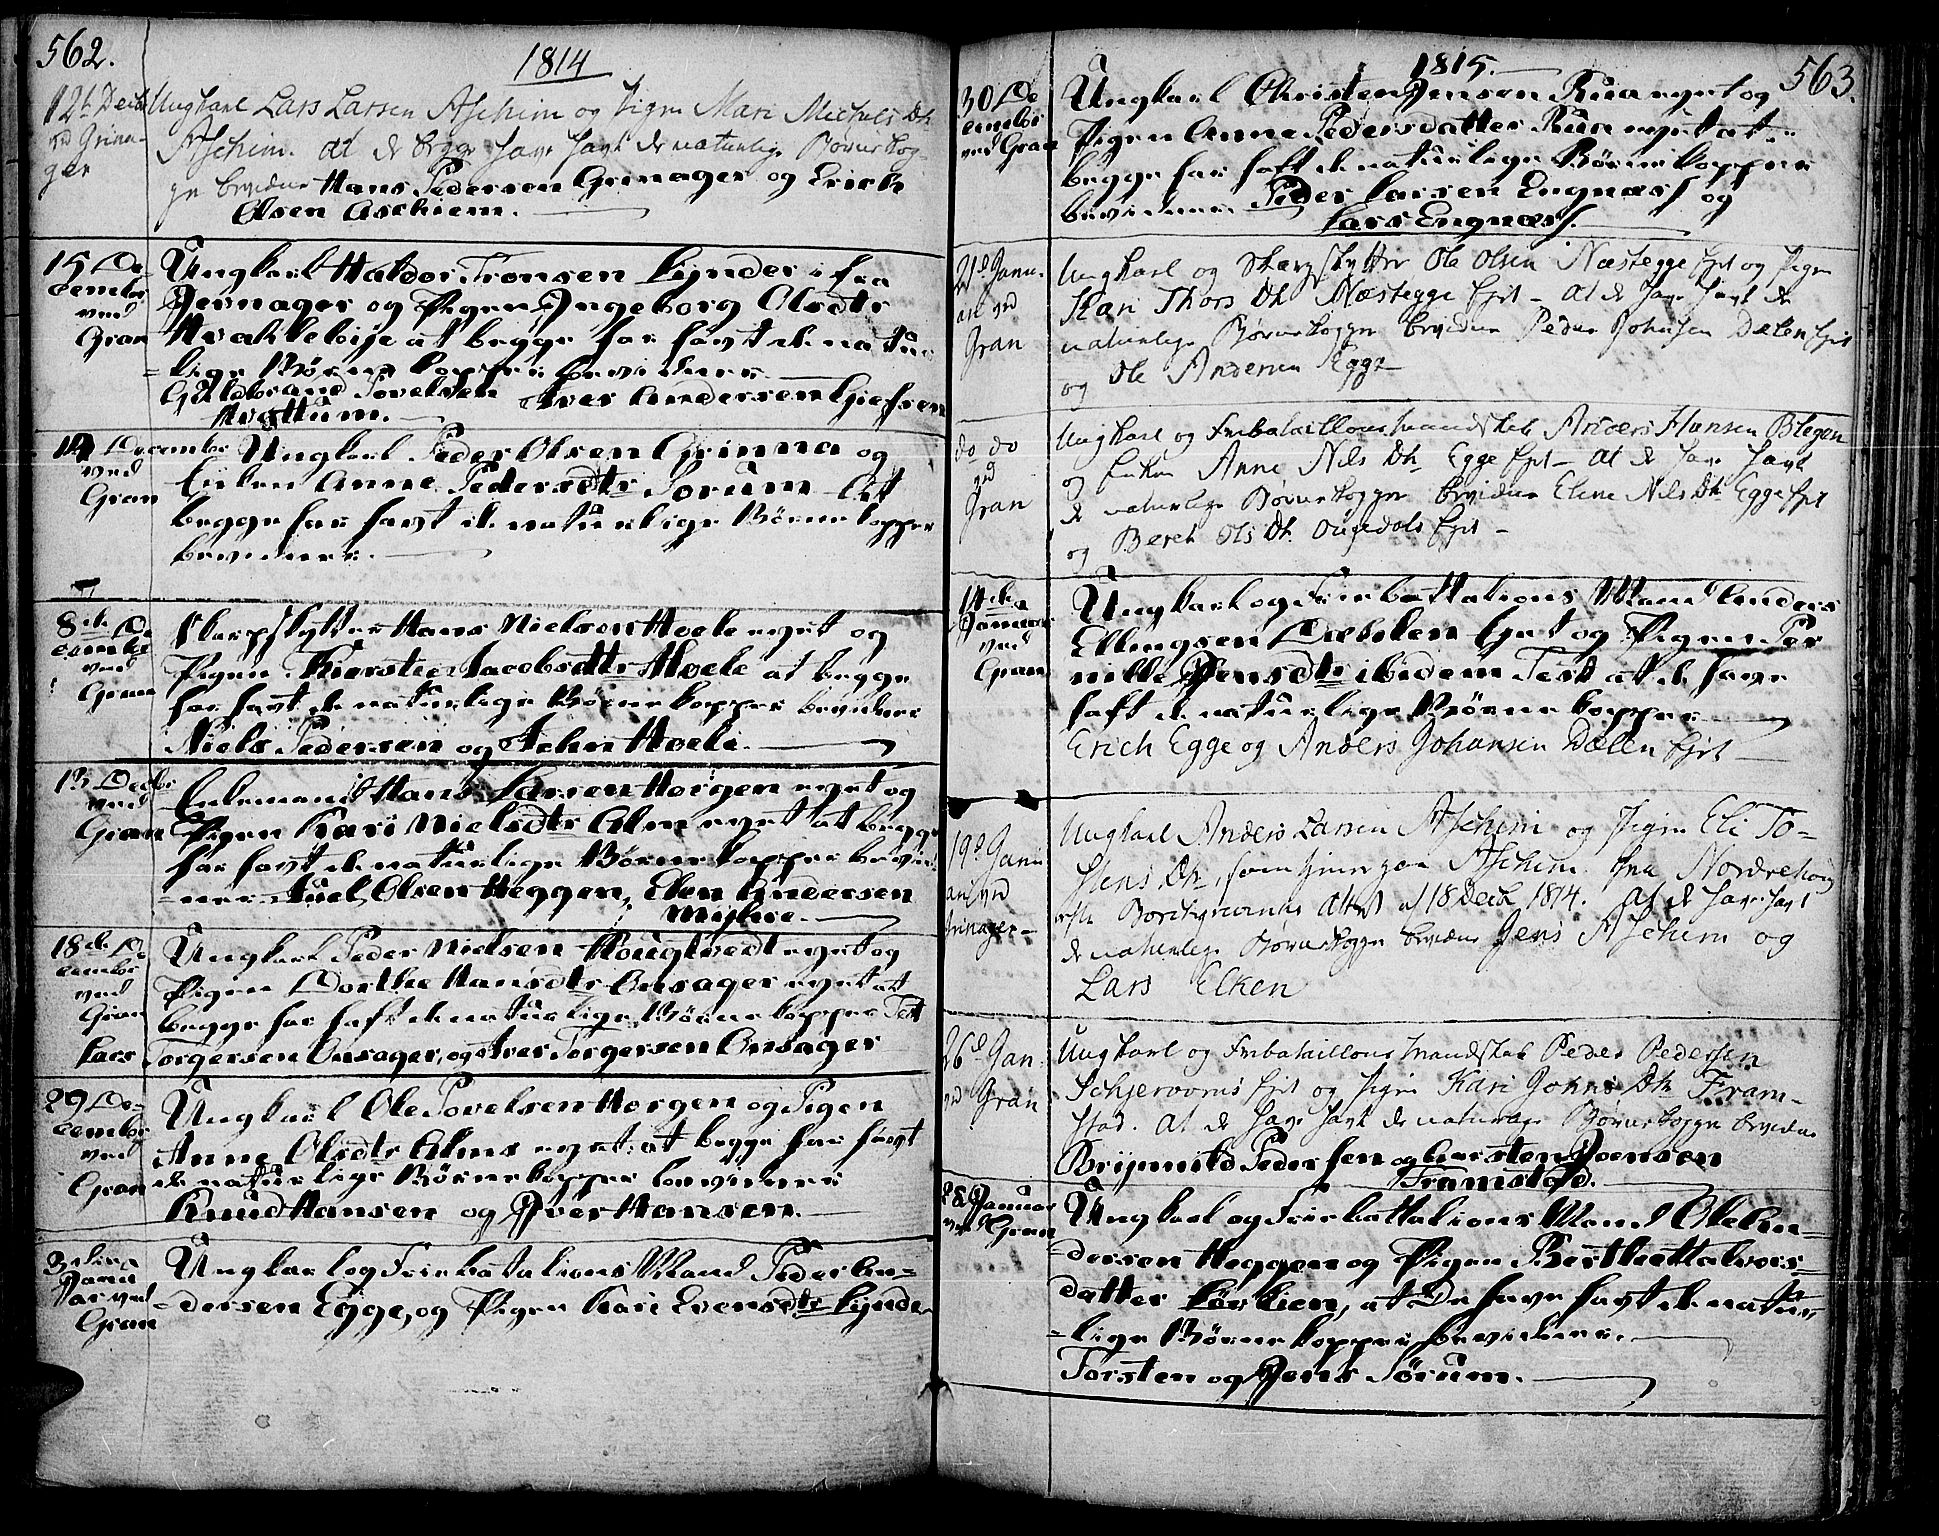 SAH, Gran prestekontor, Ministerialbok nr. 6, 1787-1824, s. 562-563